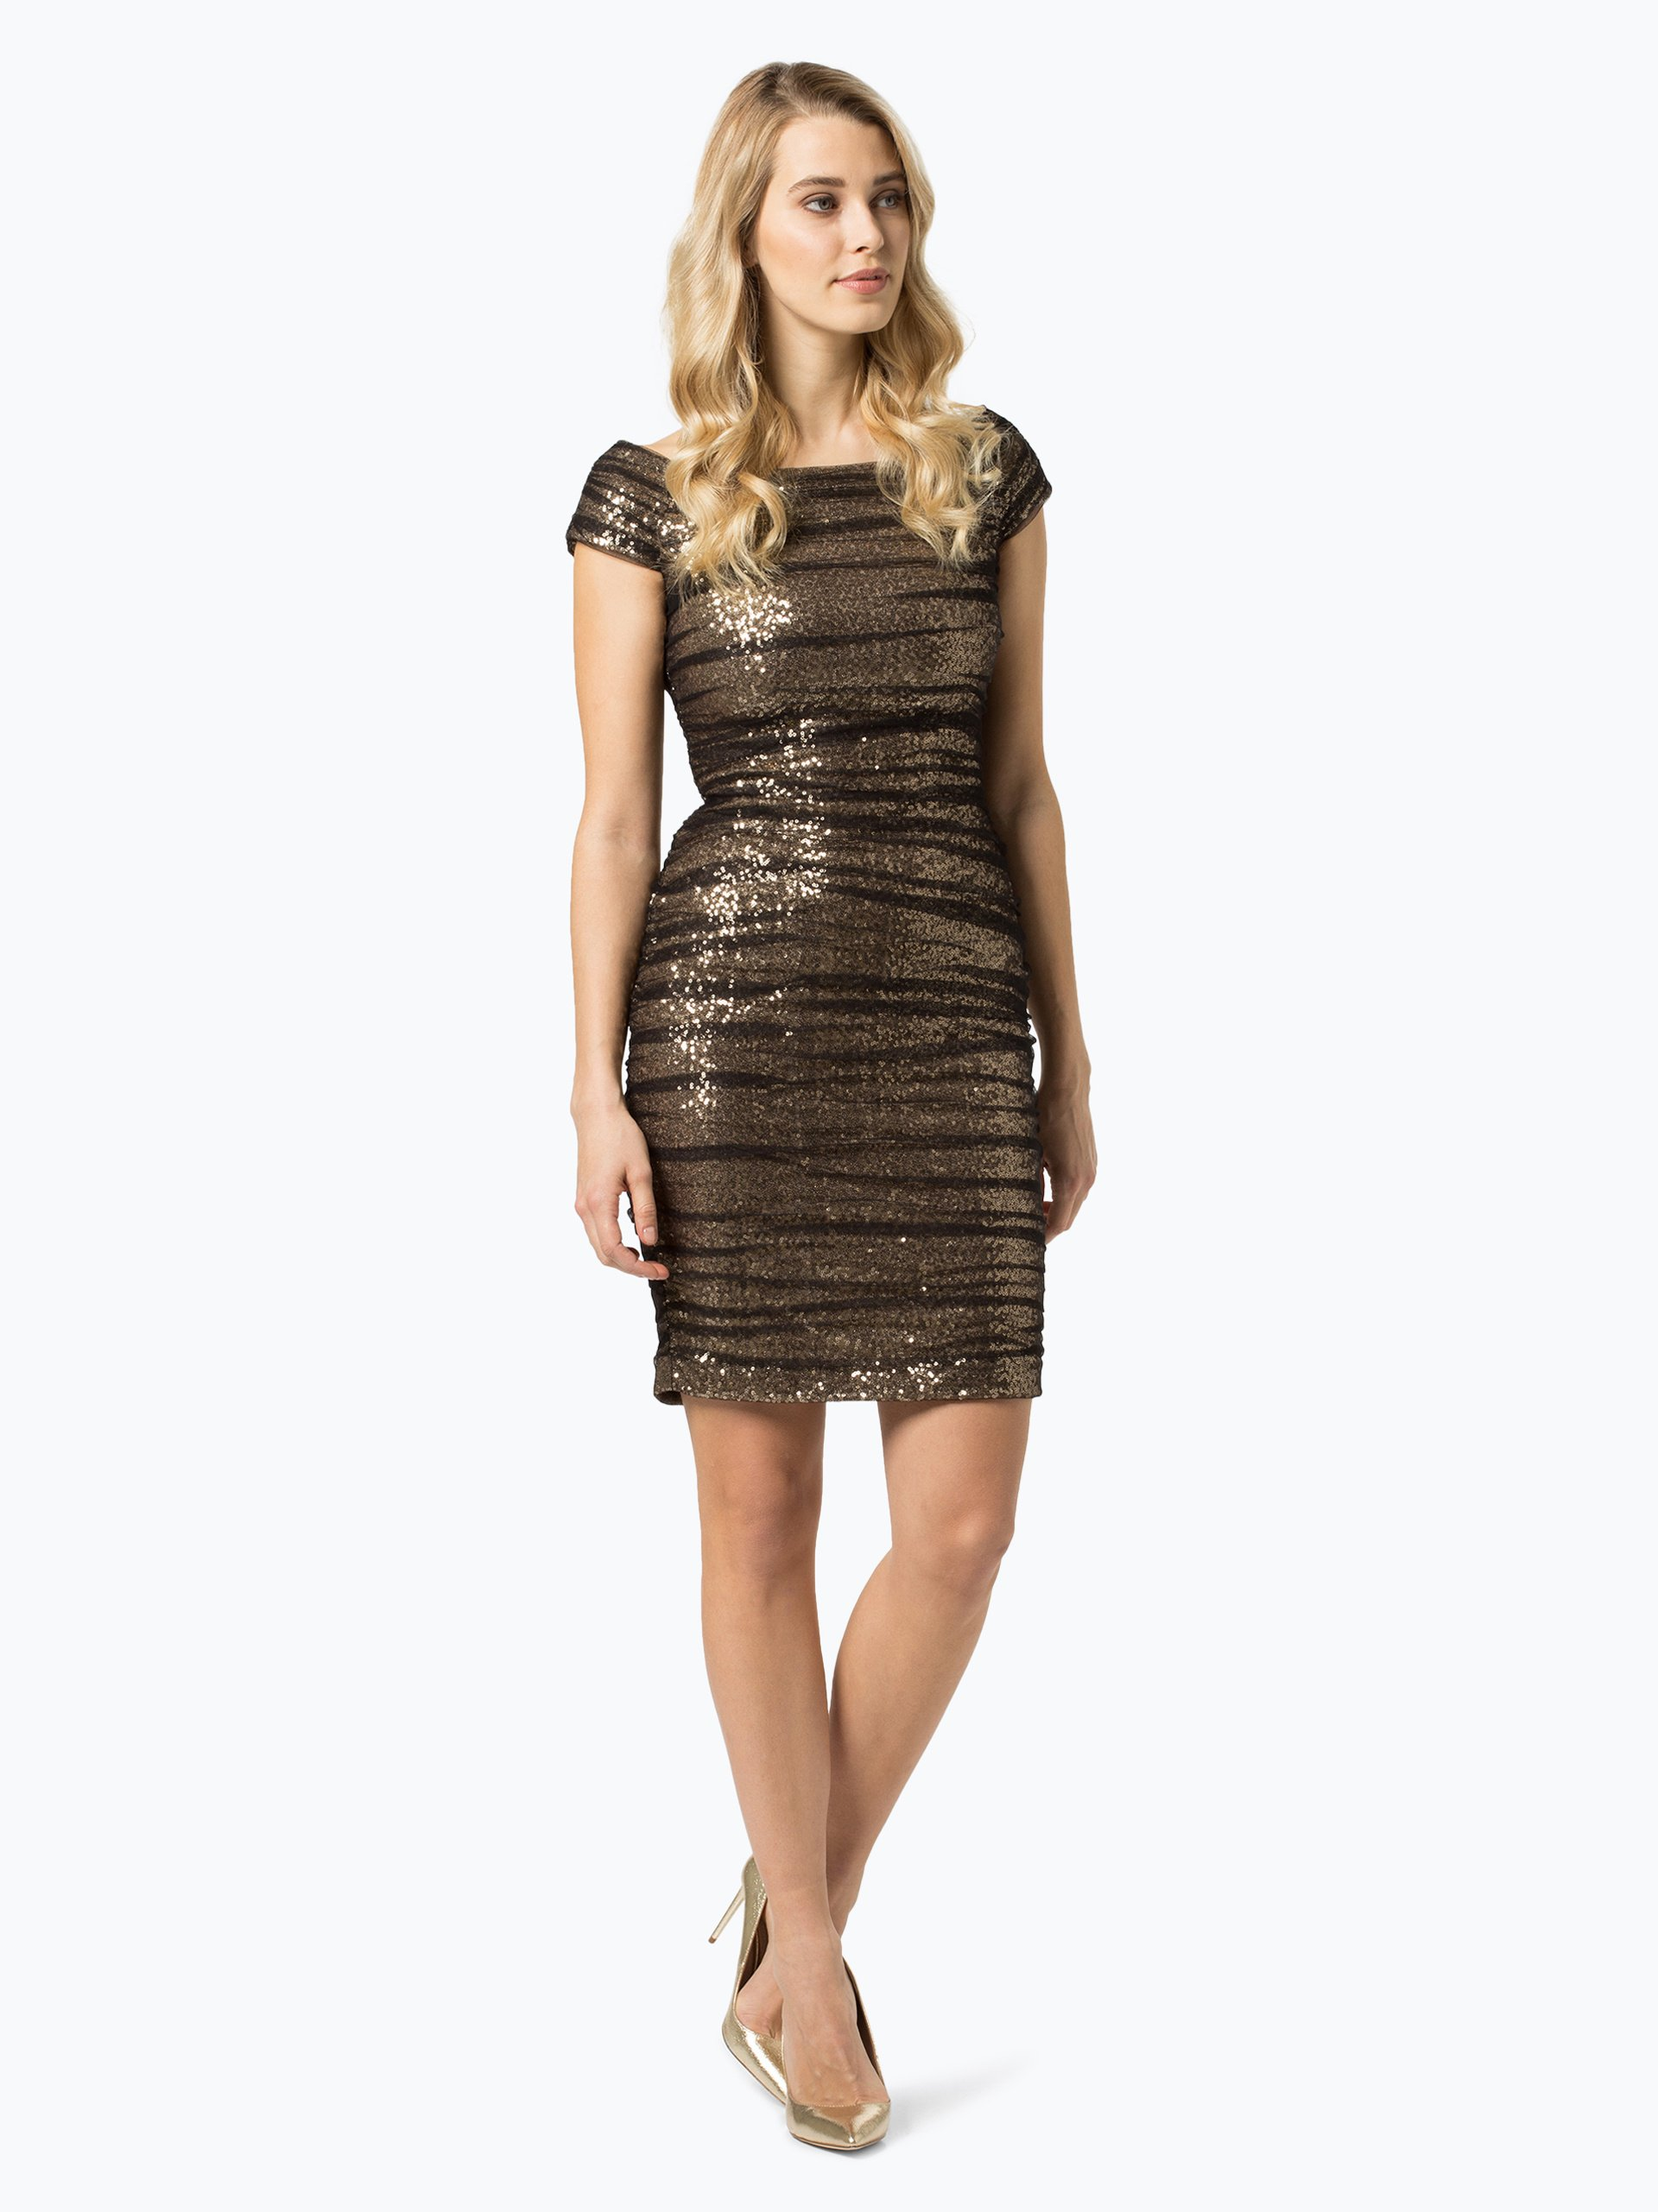 lauren ralph lauren damen kleid gold schwarz gemustert online kaufen peek und cloppenburg de. Black Bedroom Furniture Sets. Home Design Ideas